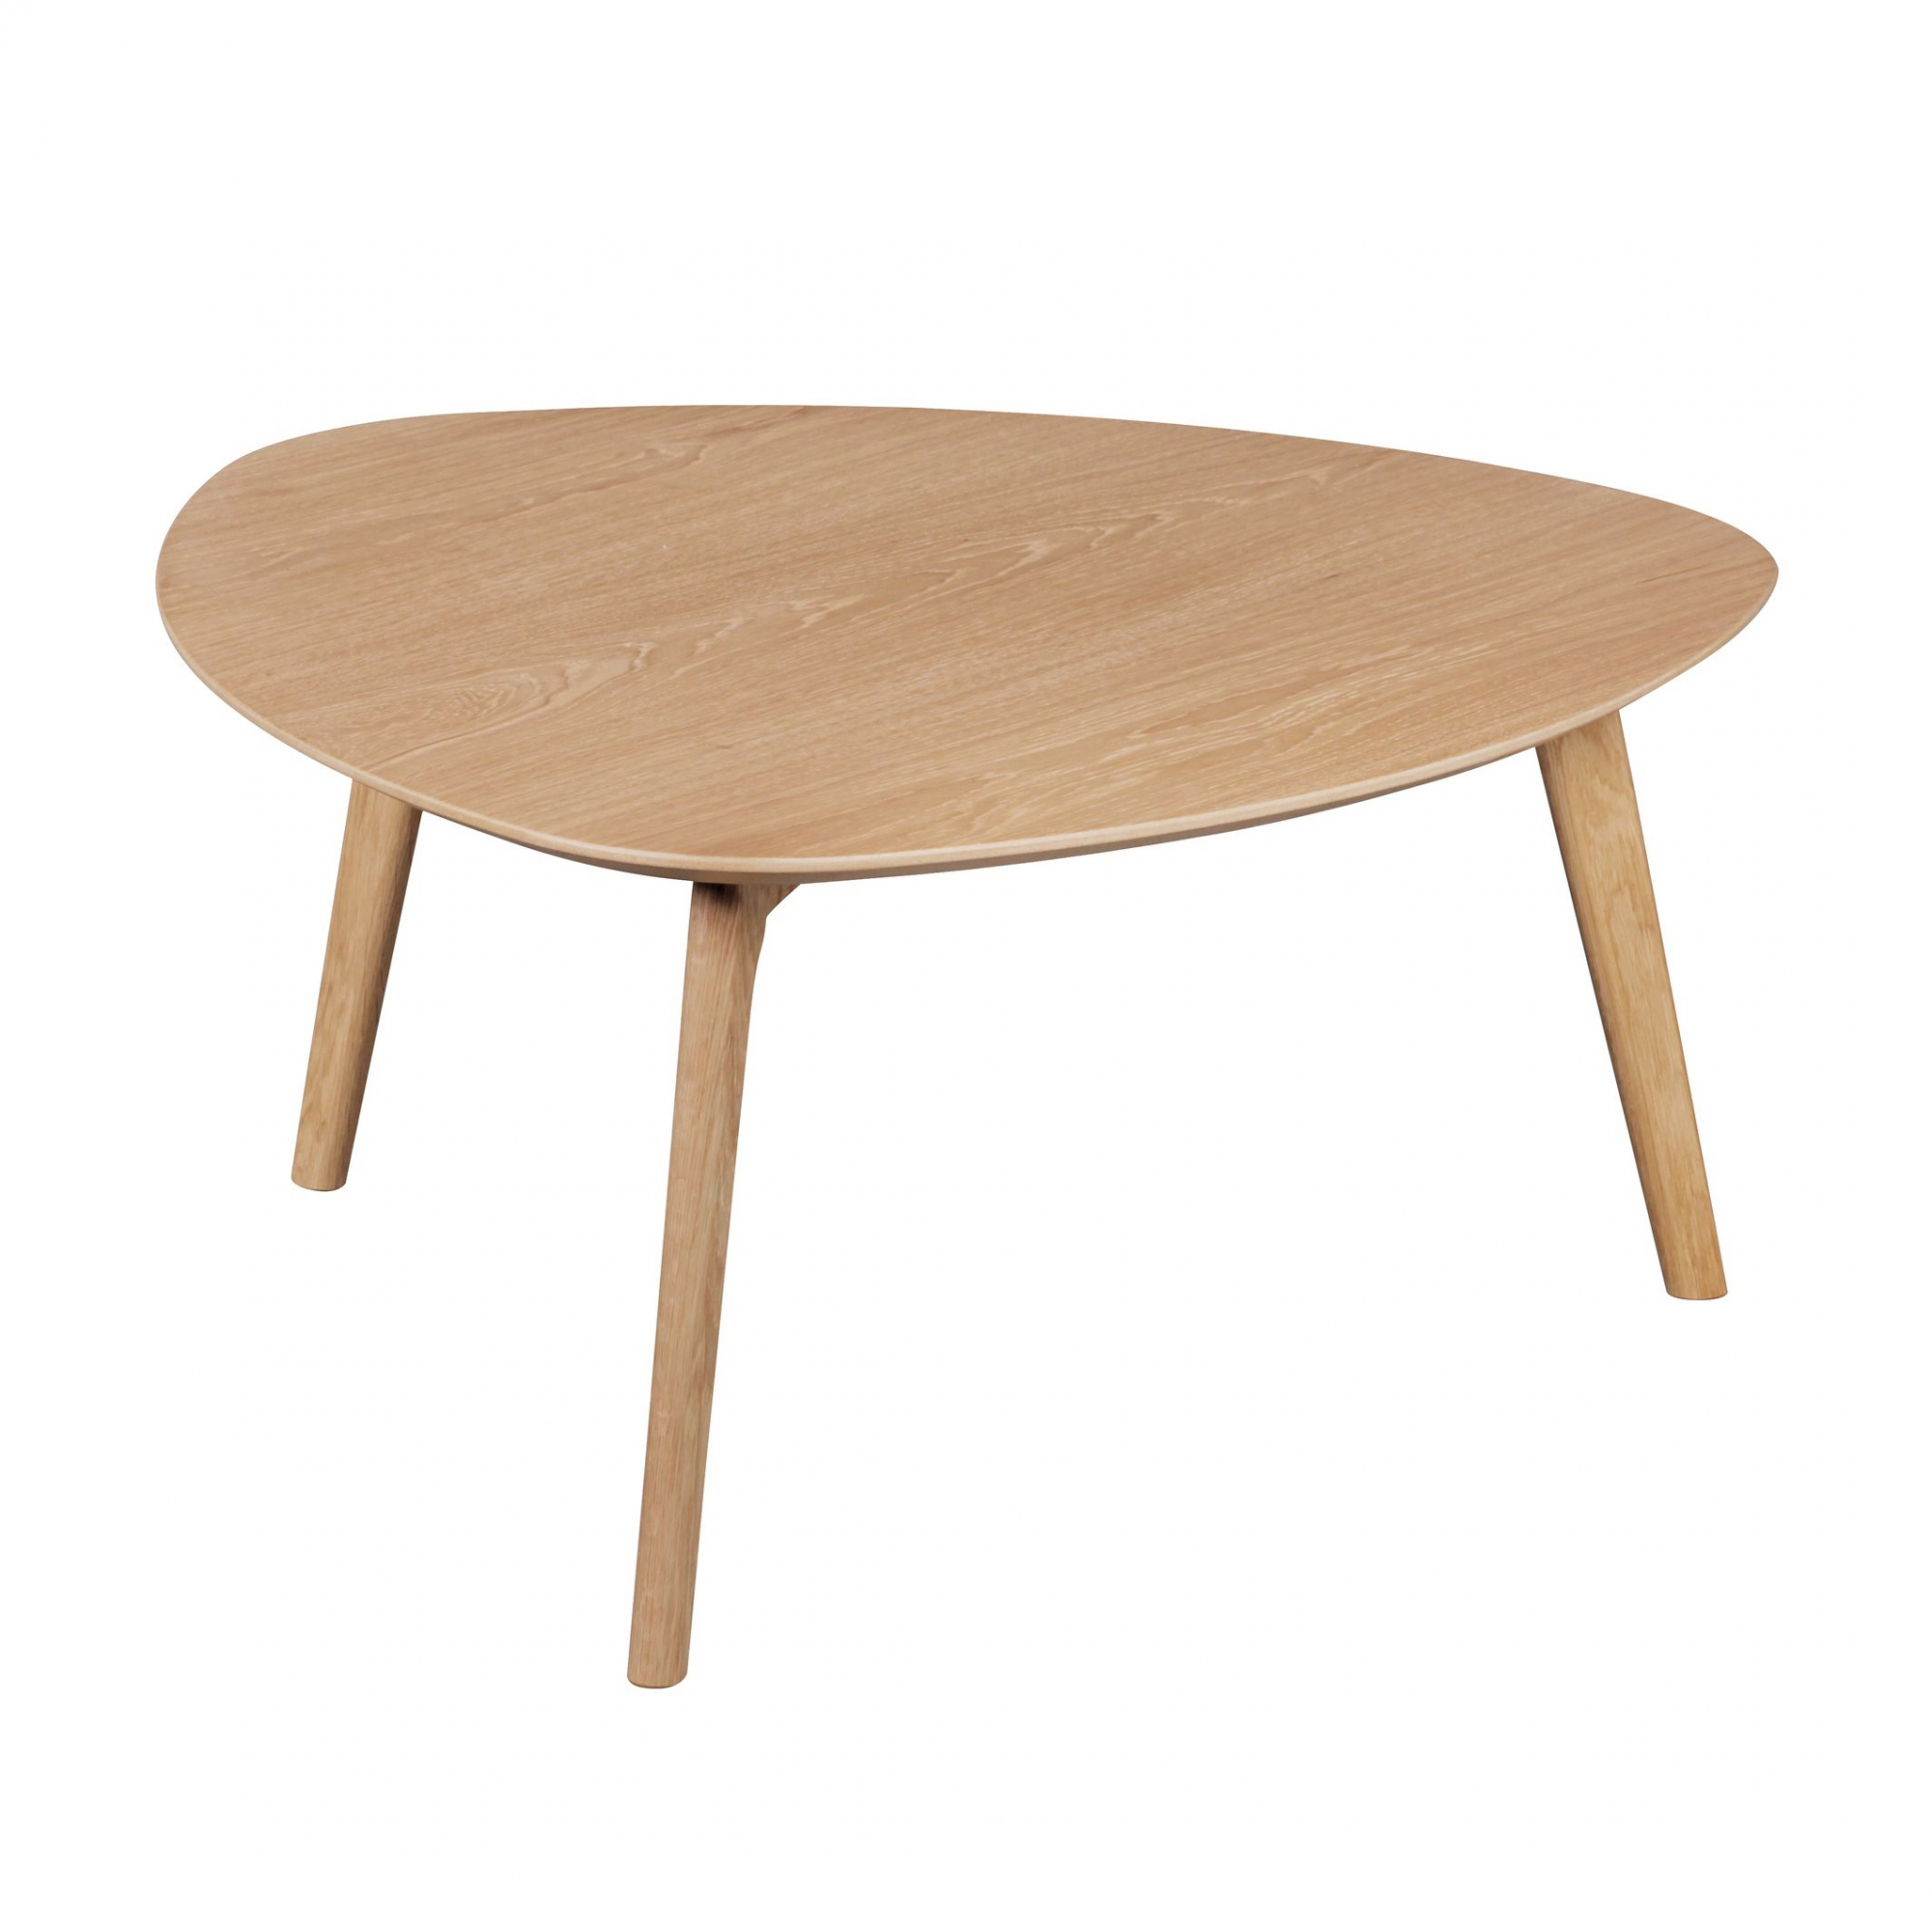 Konferenční stolek Skara, 80 cm, dub